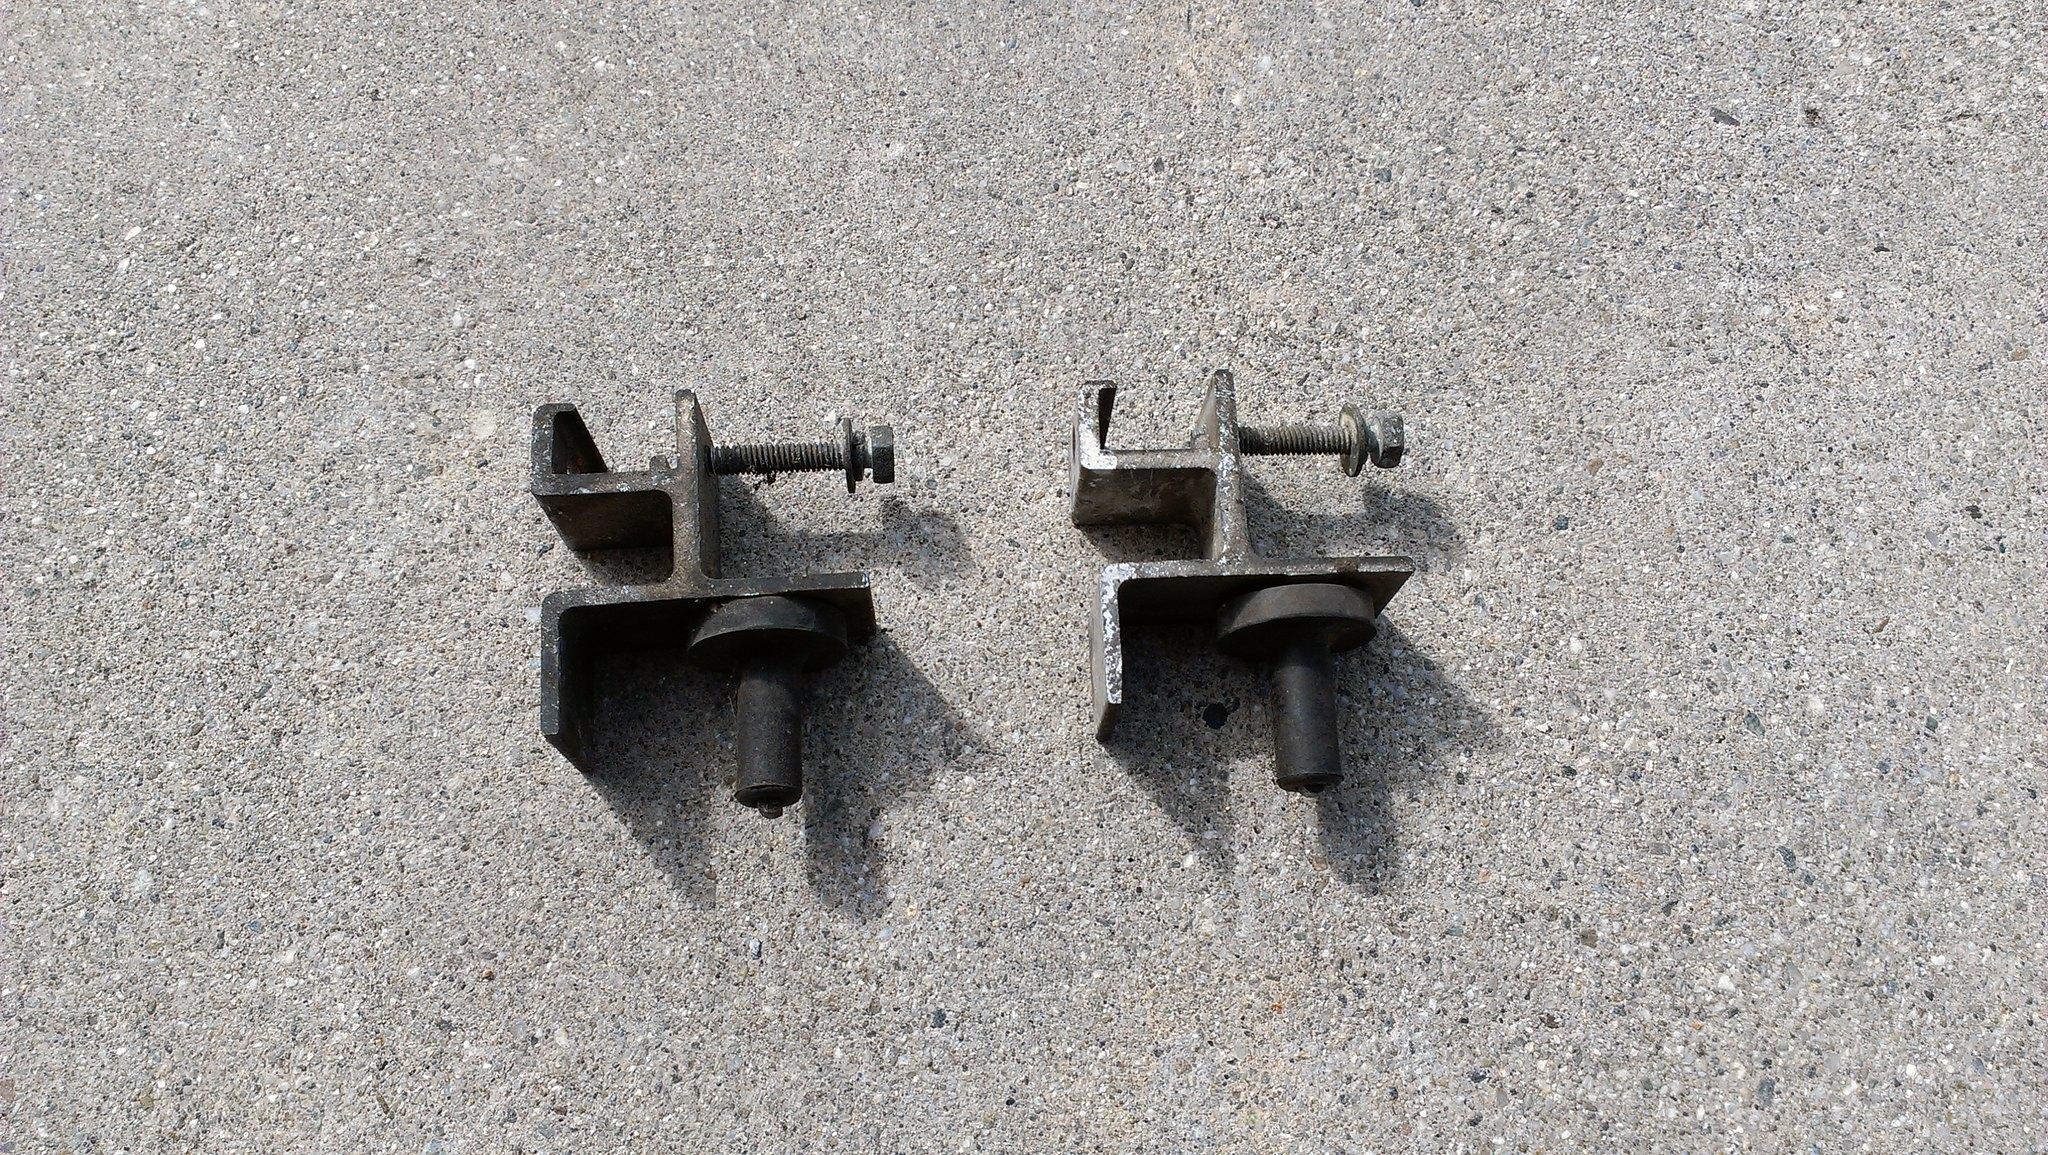 fs   for sale  1993-2001 subaru impreza motor parts